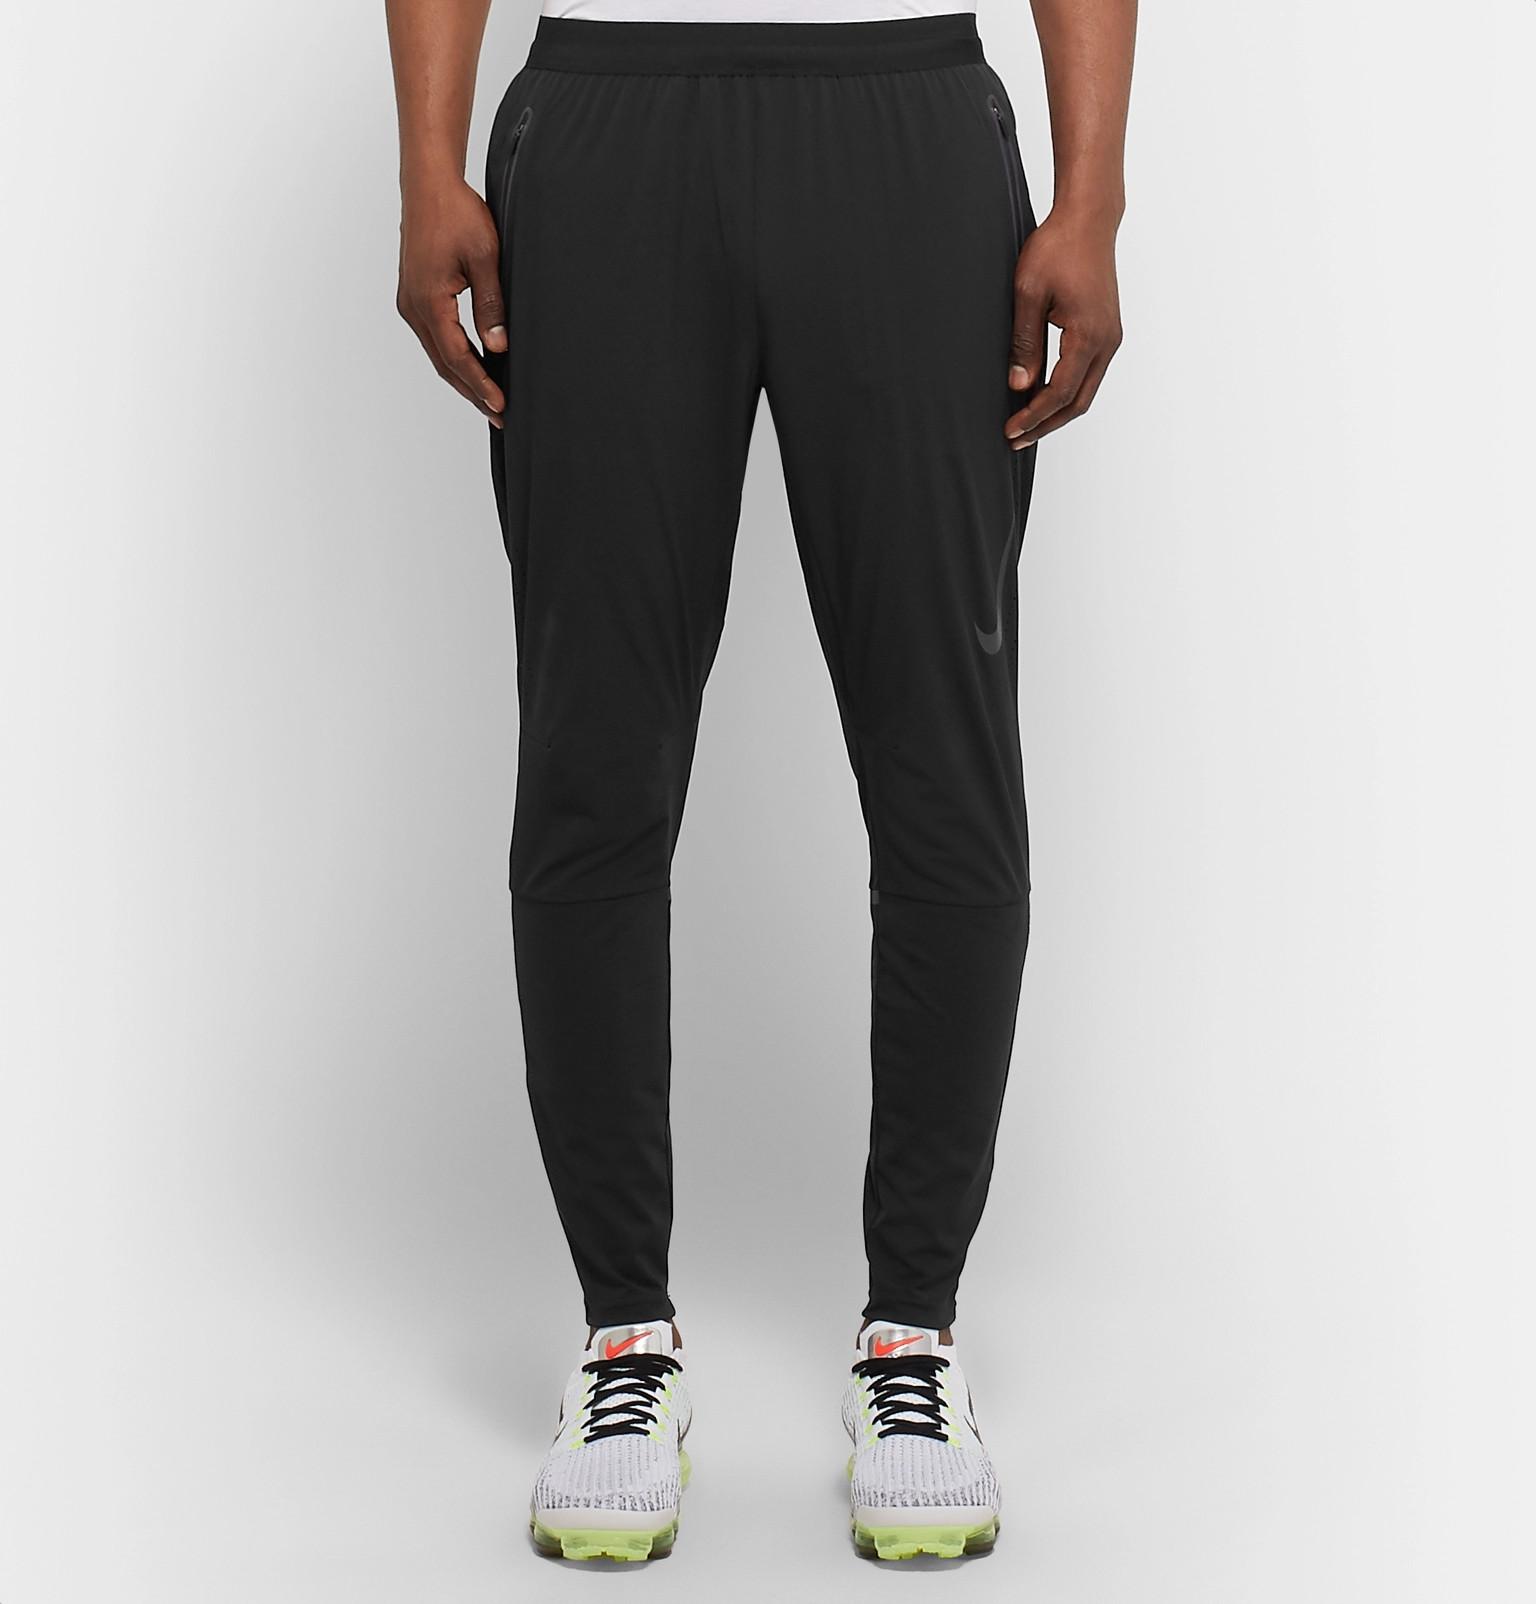 0e62ba4abc9f5 Nike Running - Swift Perforated Flex Dri-FIT Sweatpants